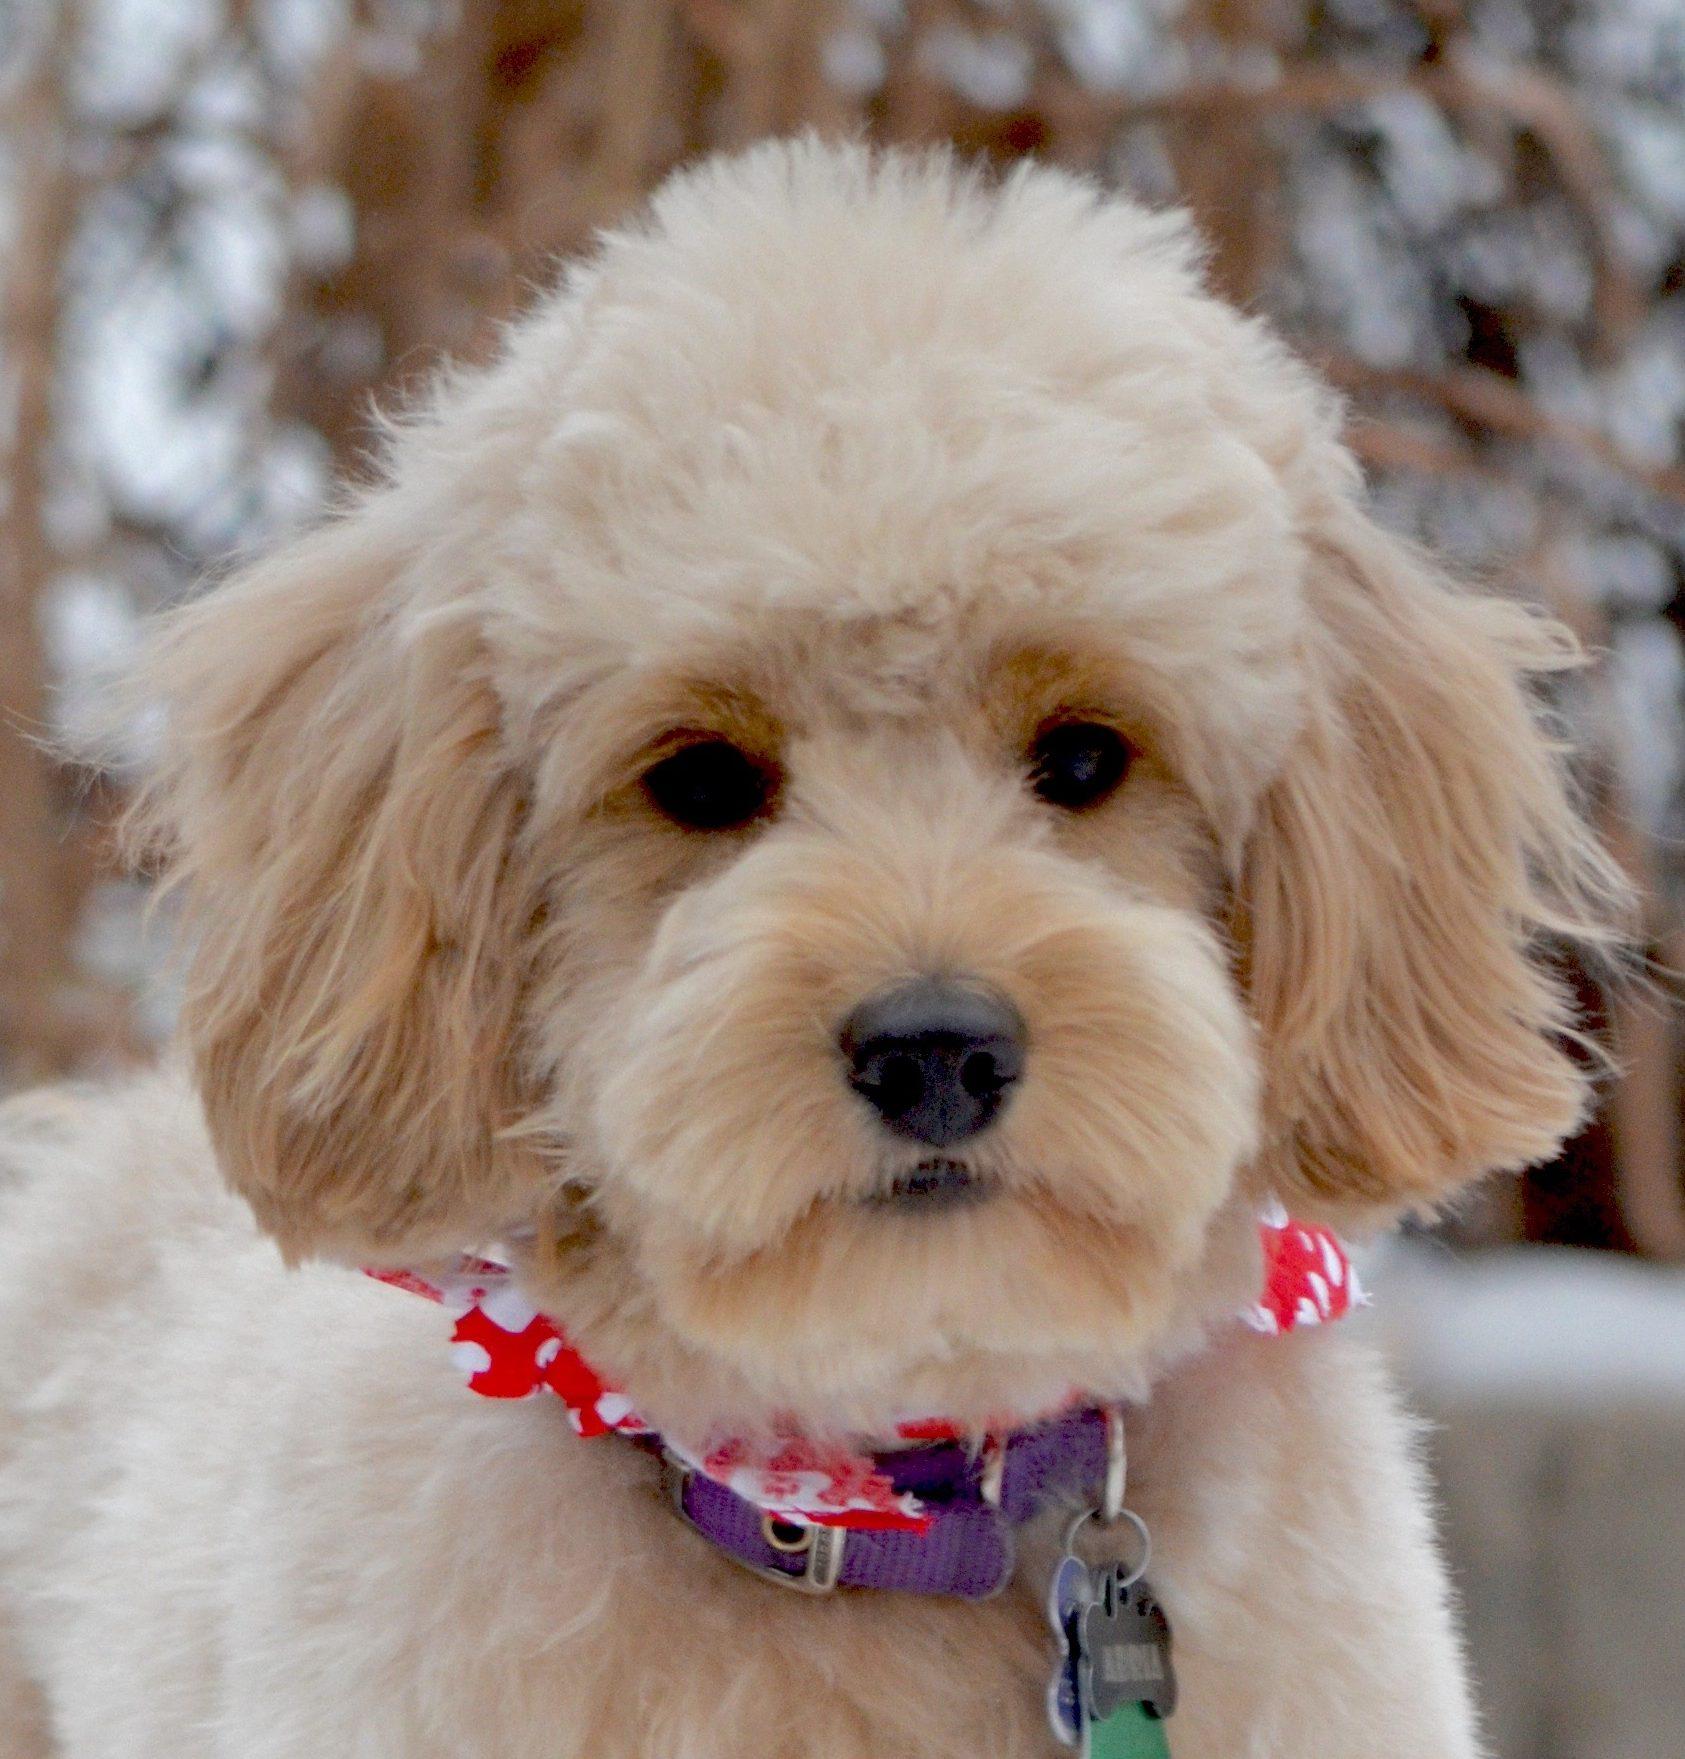 Fullsize Of Poodle Puppy Cut